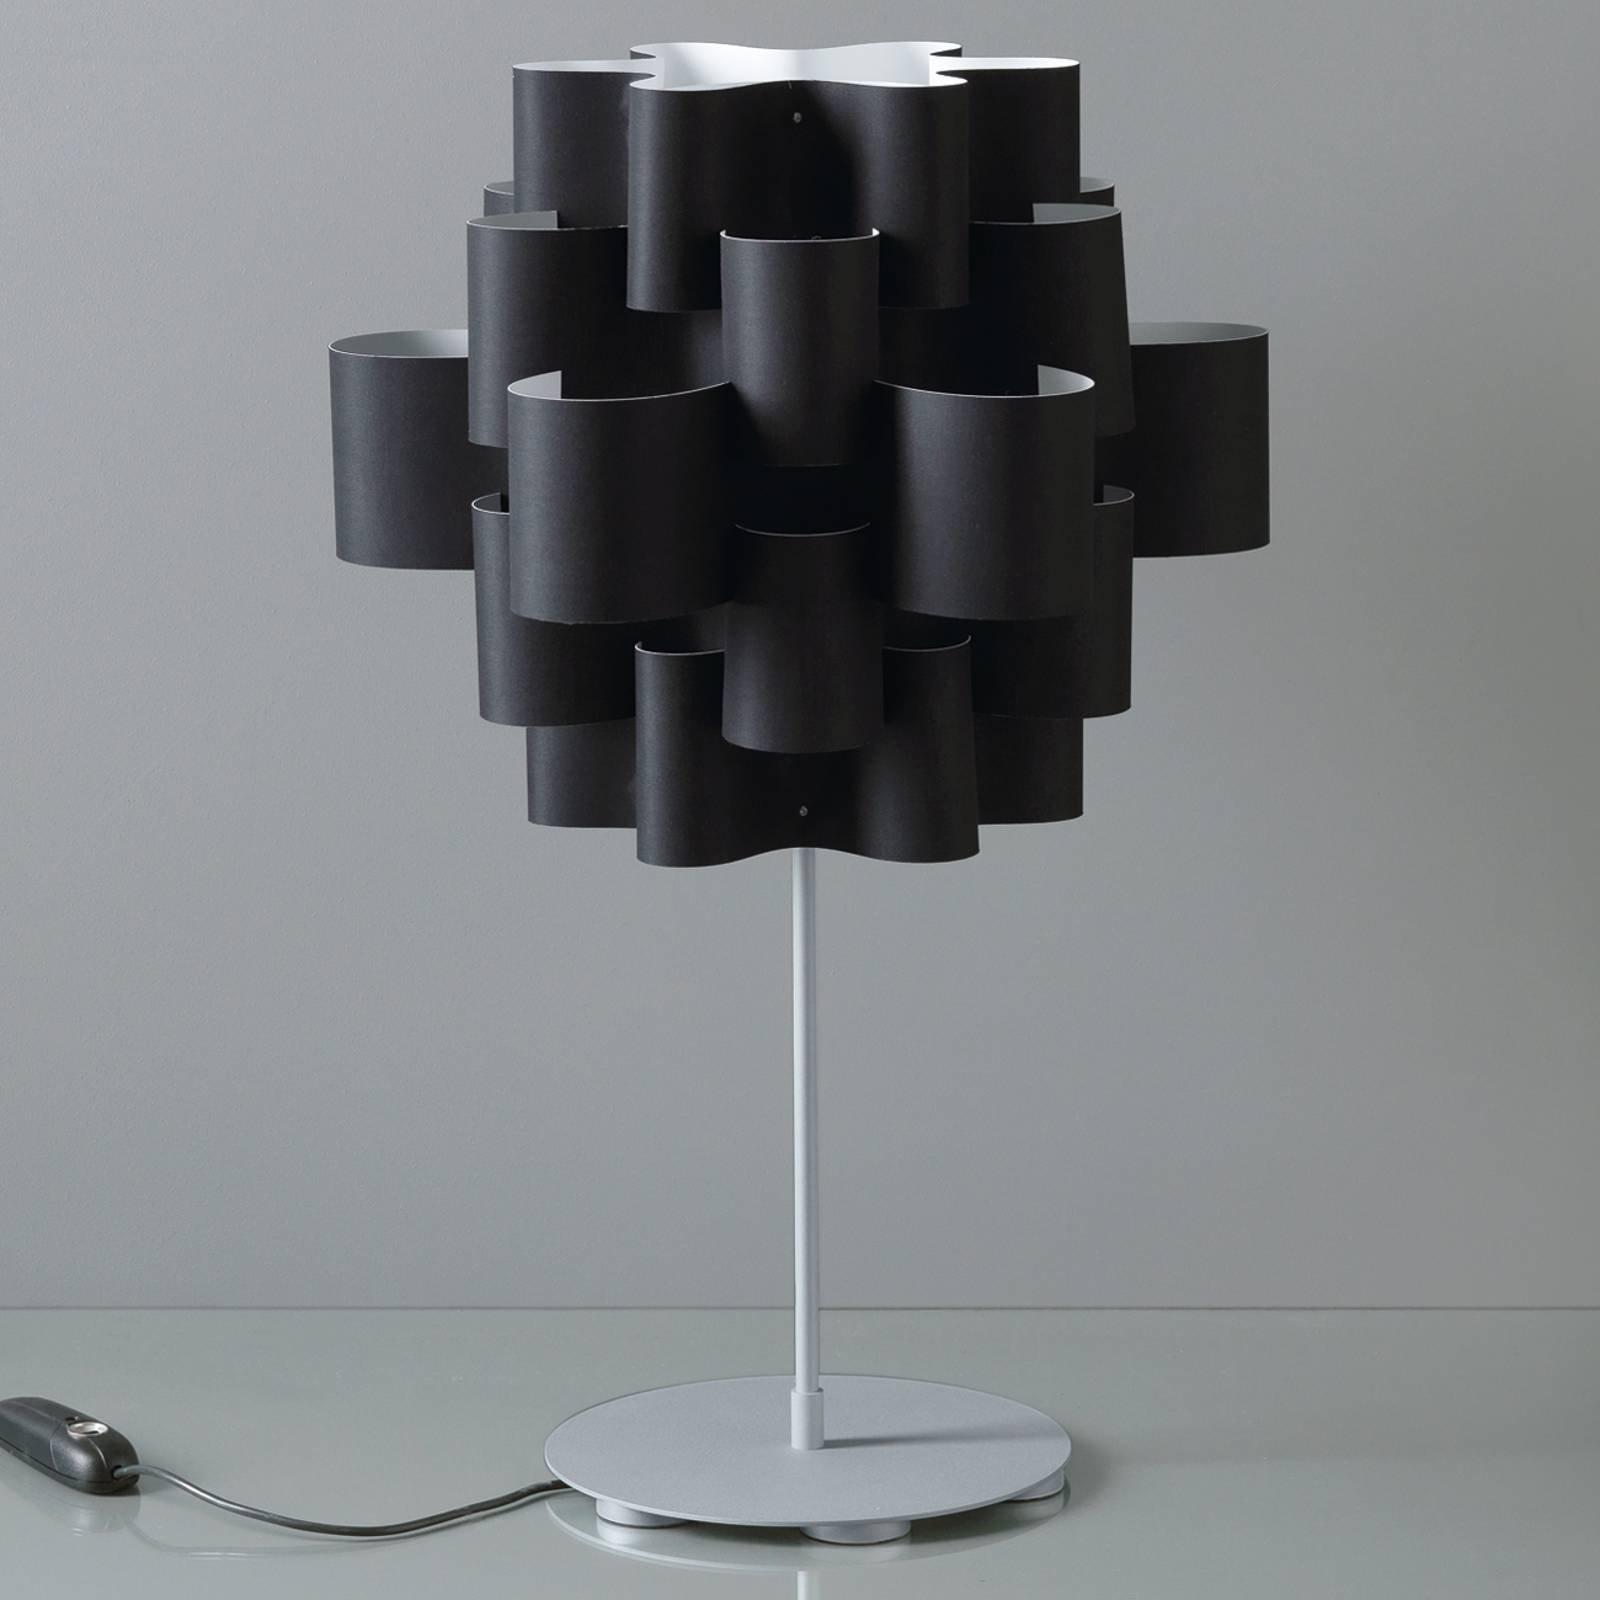 Desoigner-bordlampe, svart